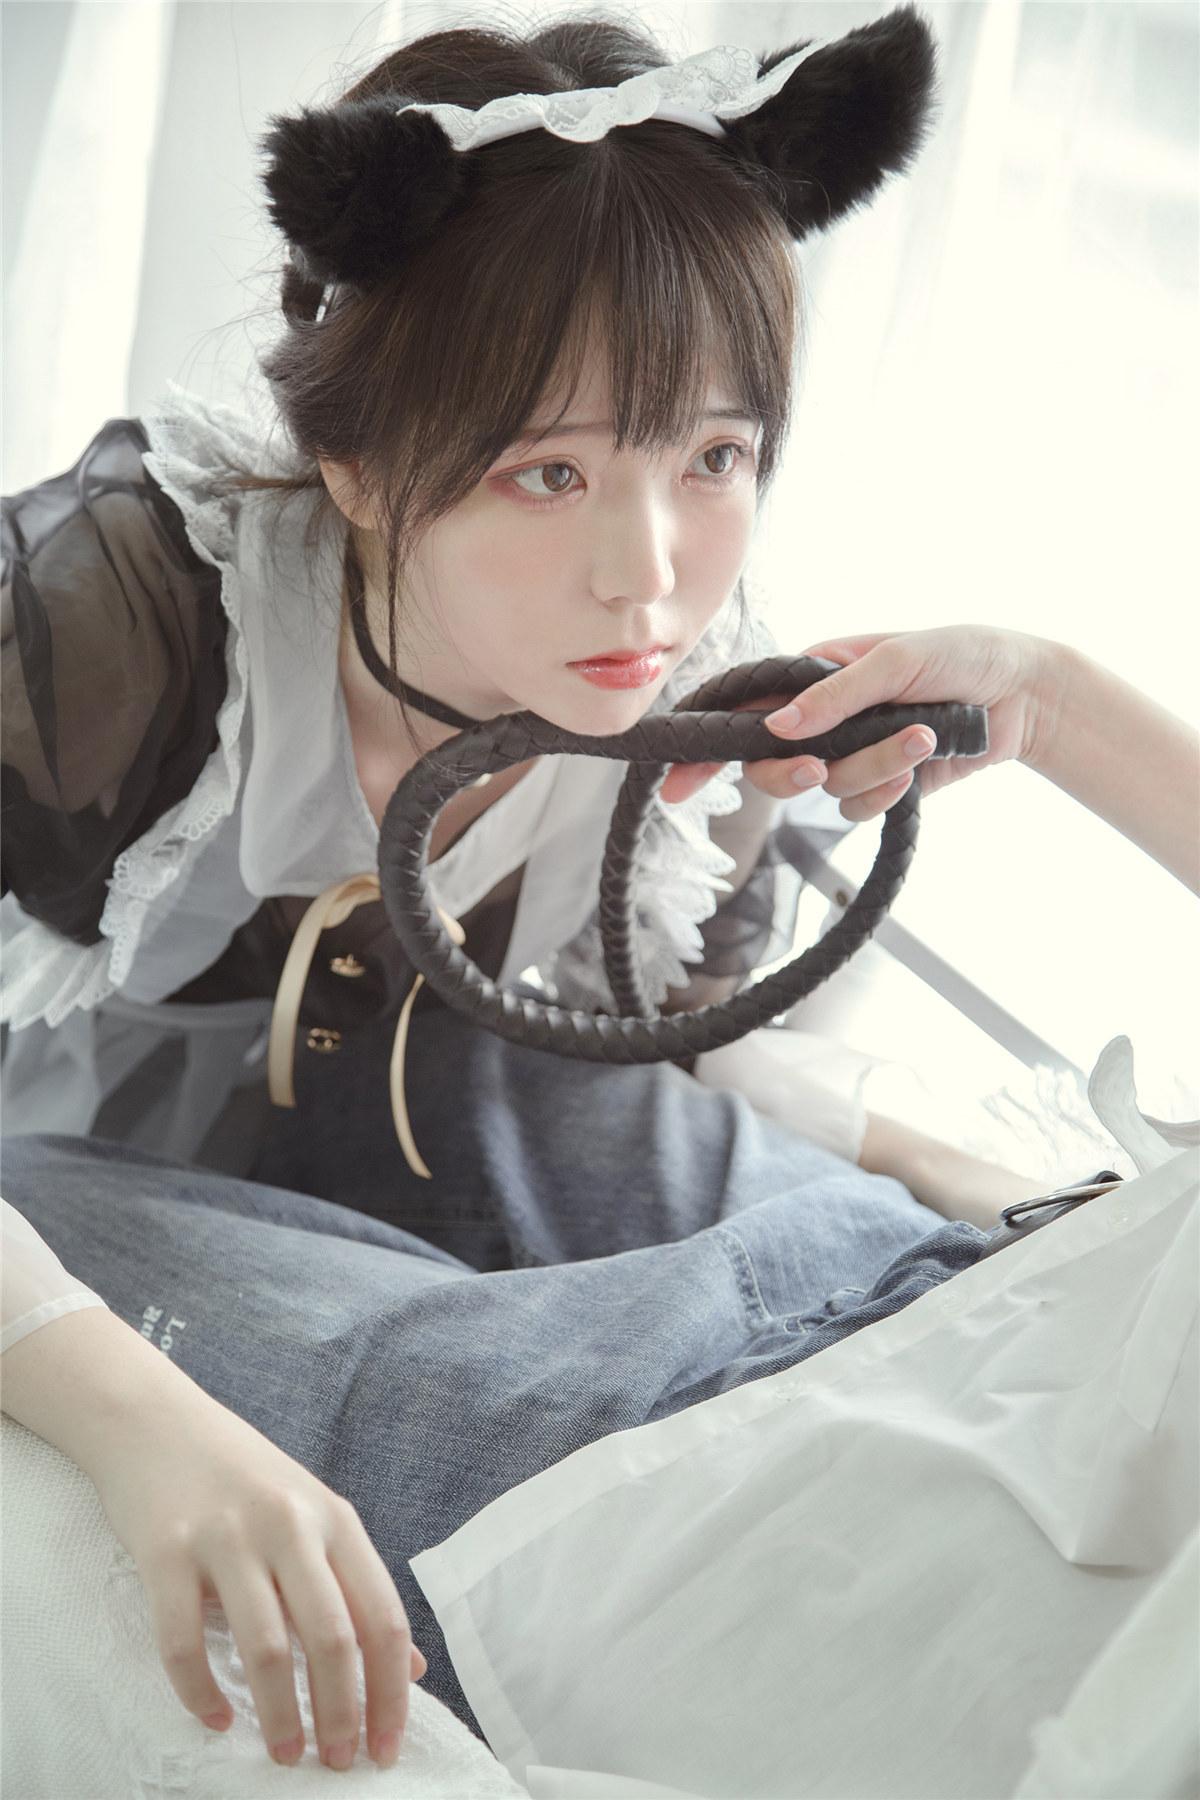 Fushii_海堂 透明女仆COS作品分享-觅爱图